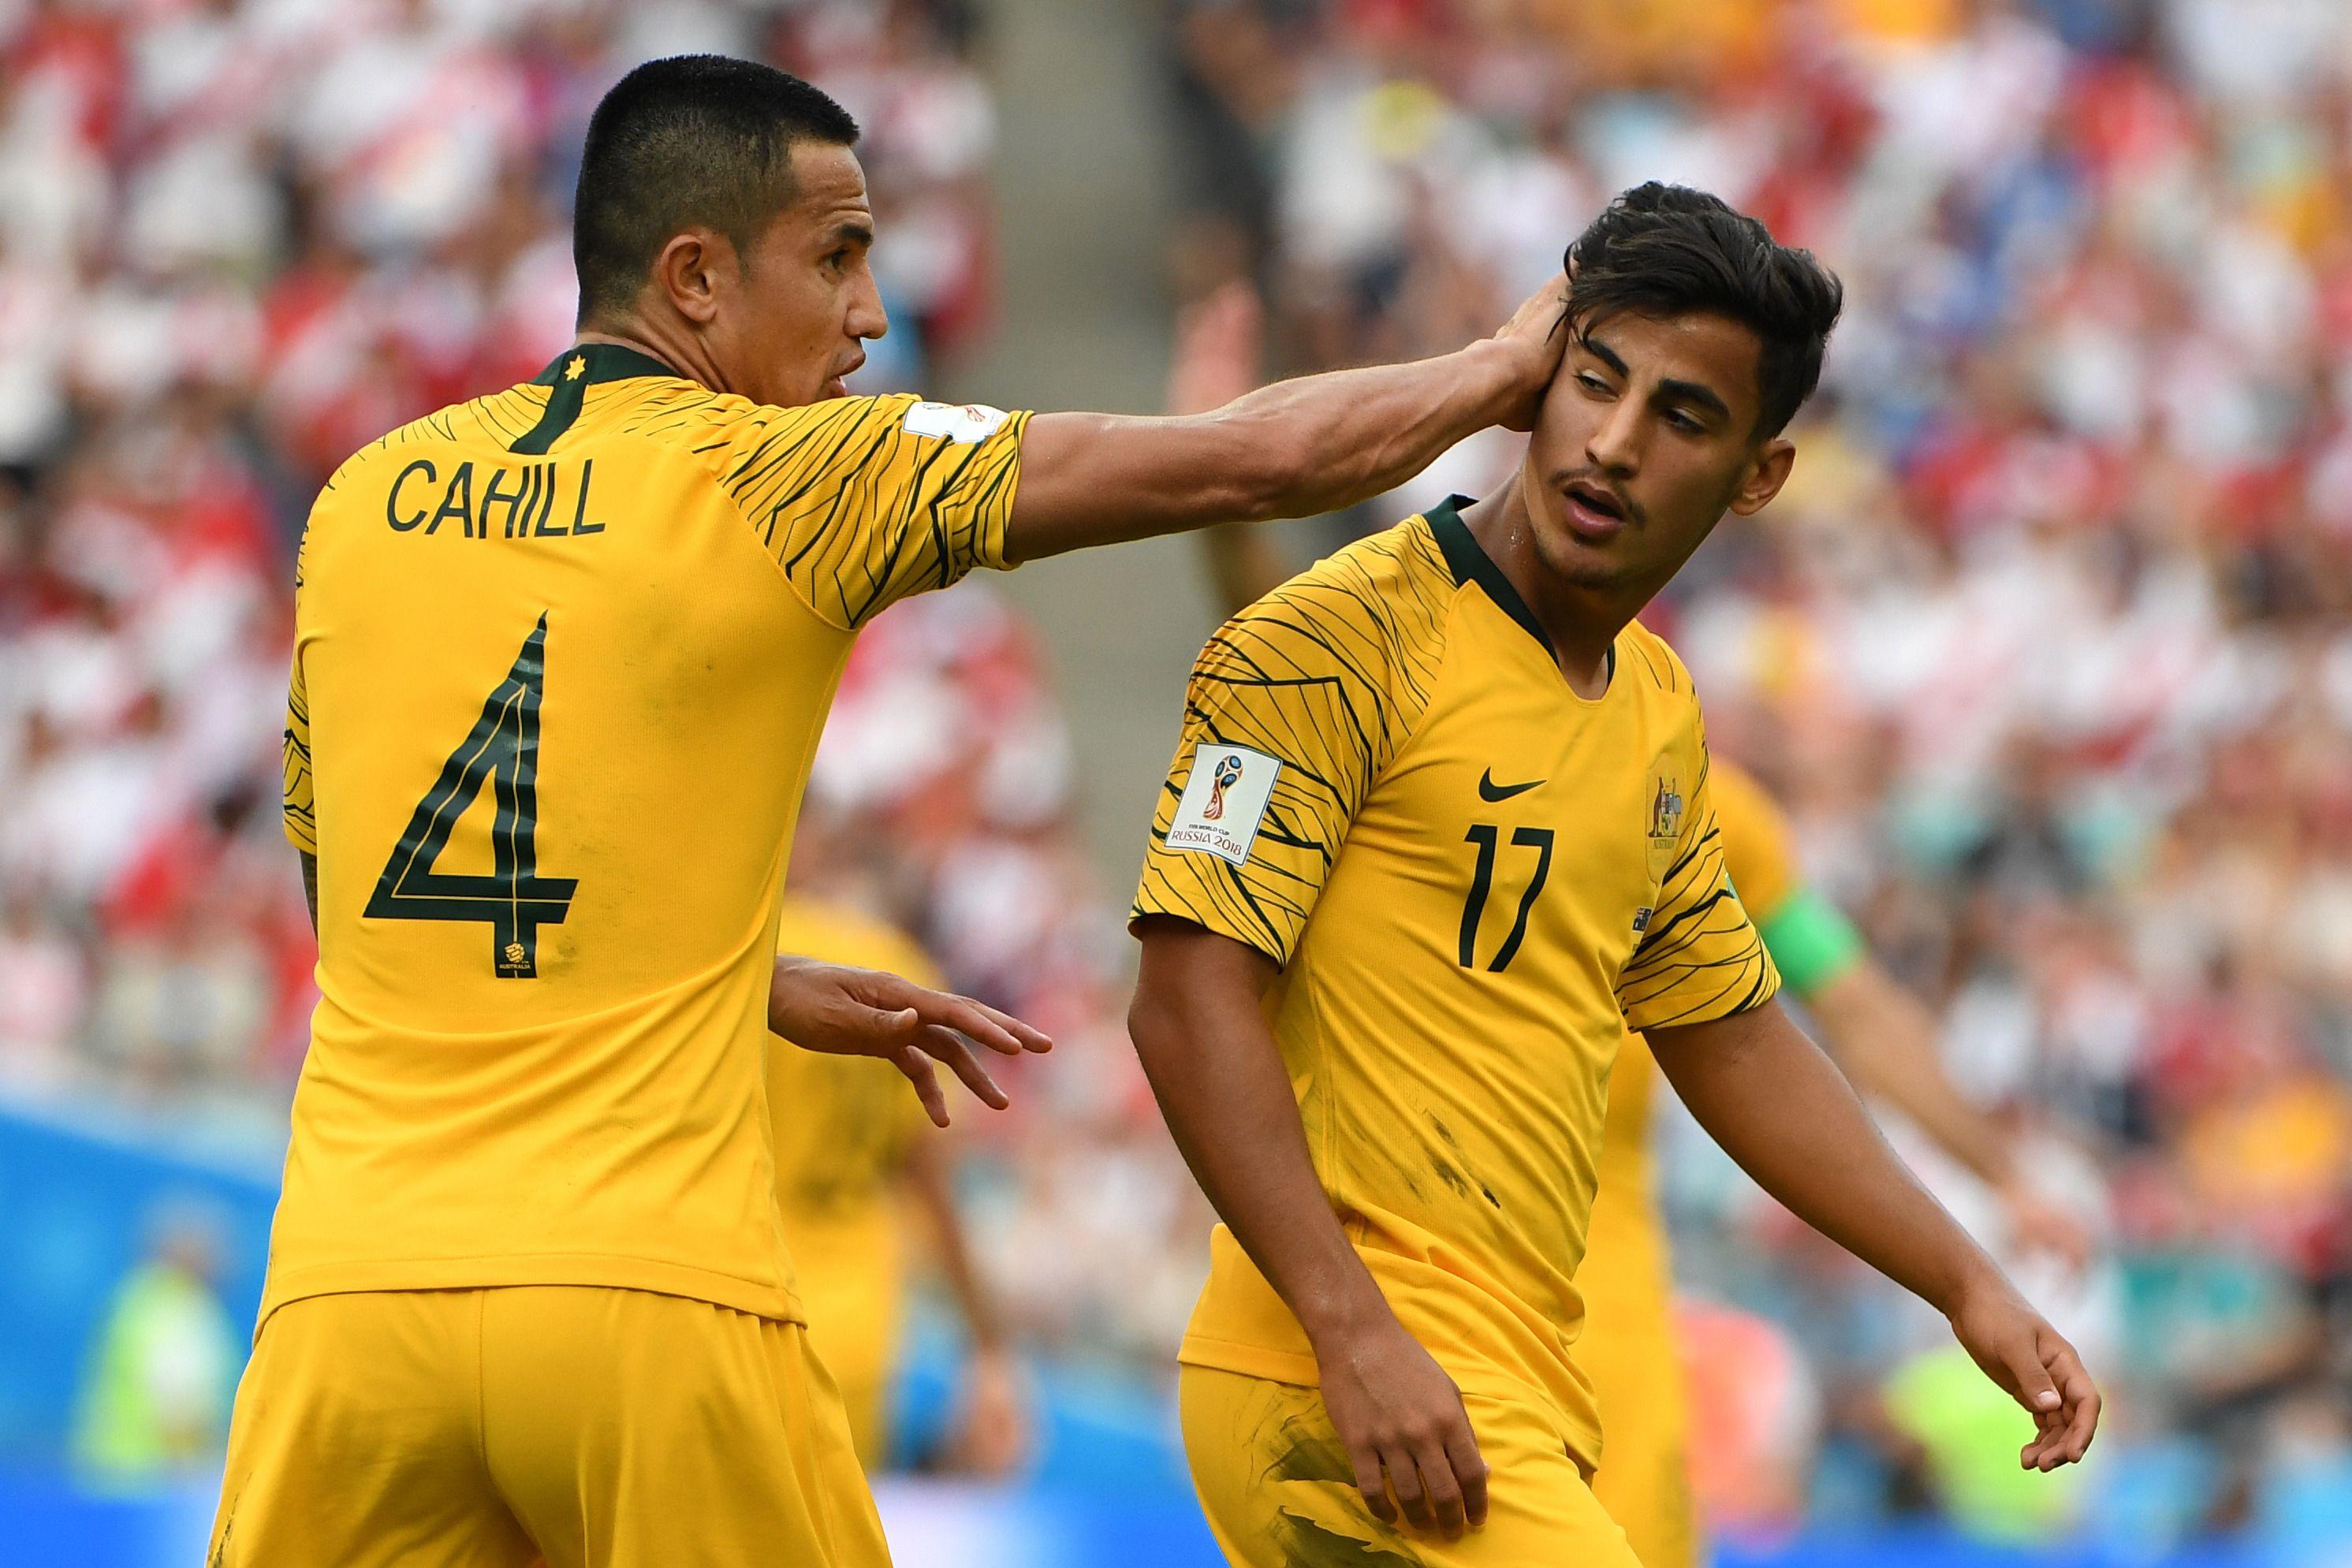 Socceroos legend Mark Schwarzer advises starlet Daniel Arzani on European move